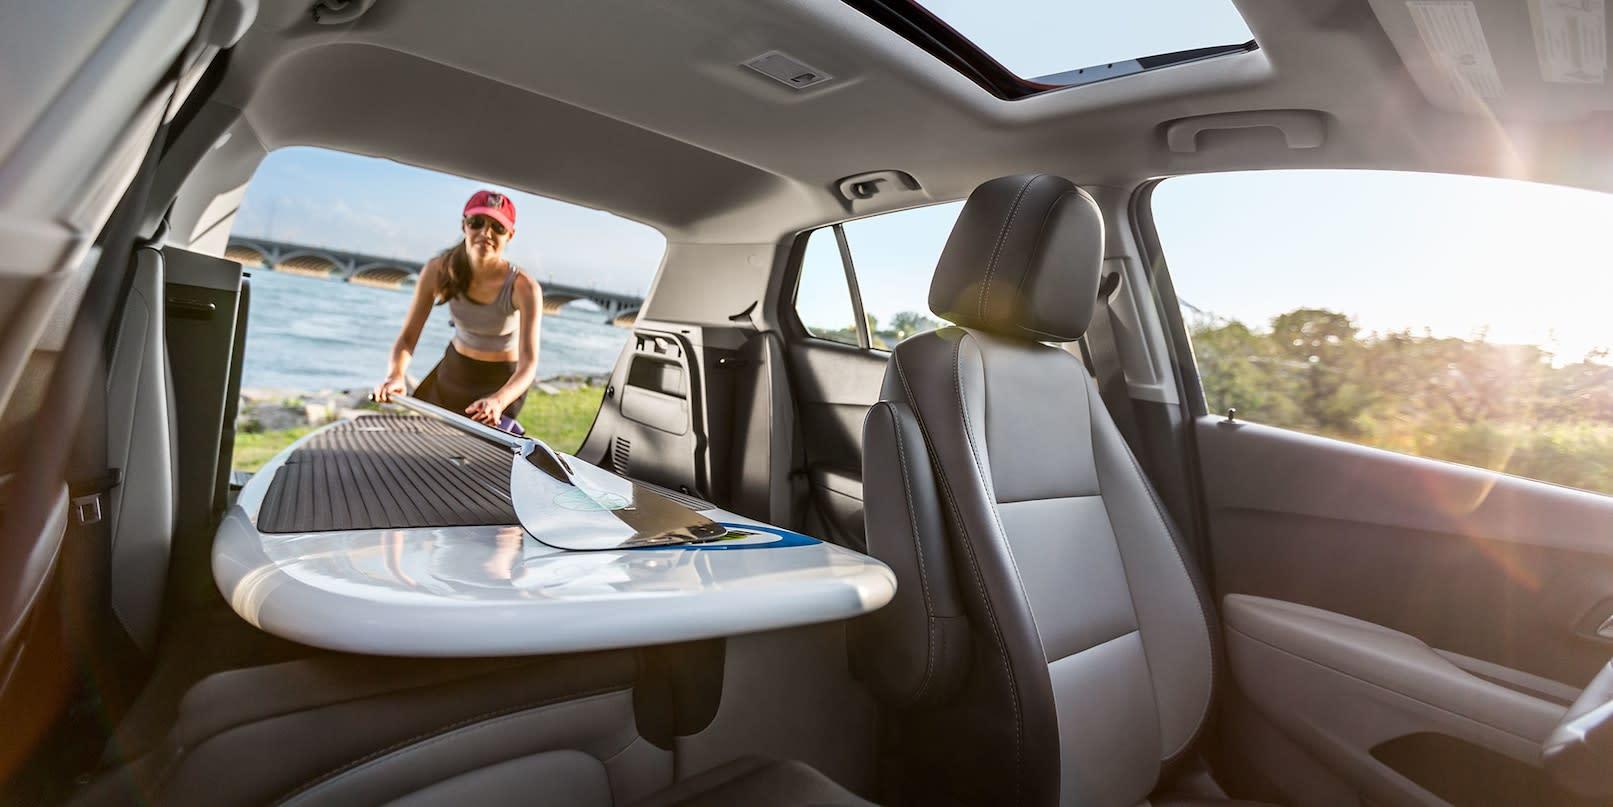 2019 Chevrolet Trax Cargo Space